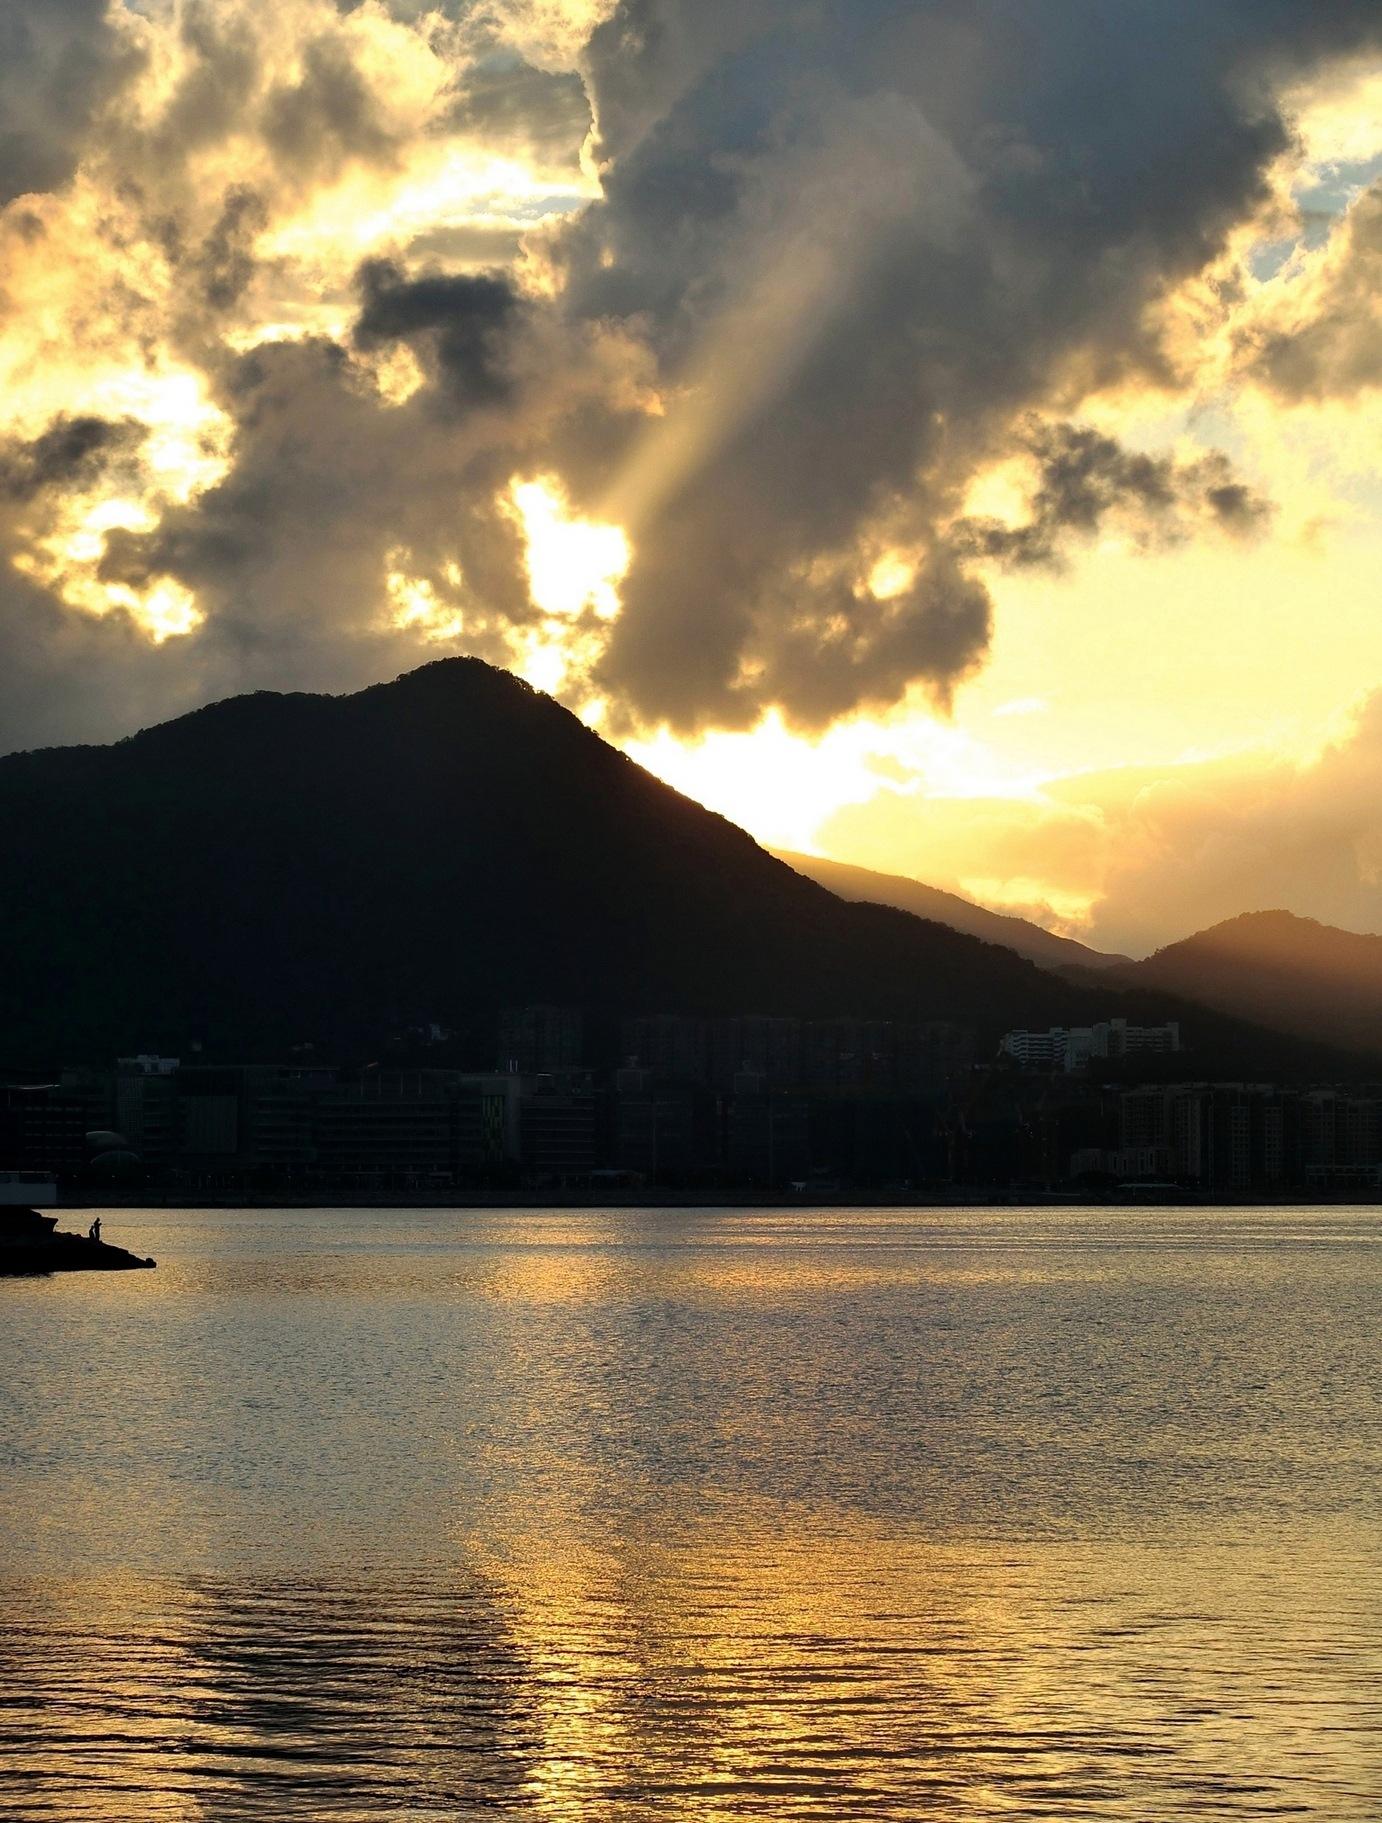 Wu Kai Sha sunset-2 by pop88123